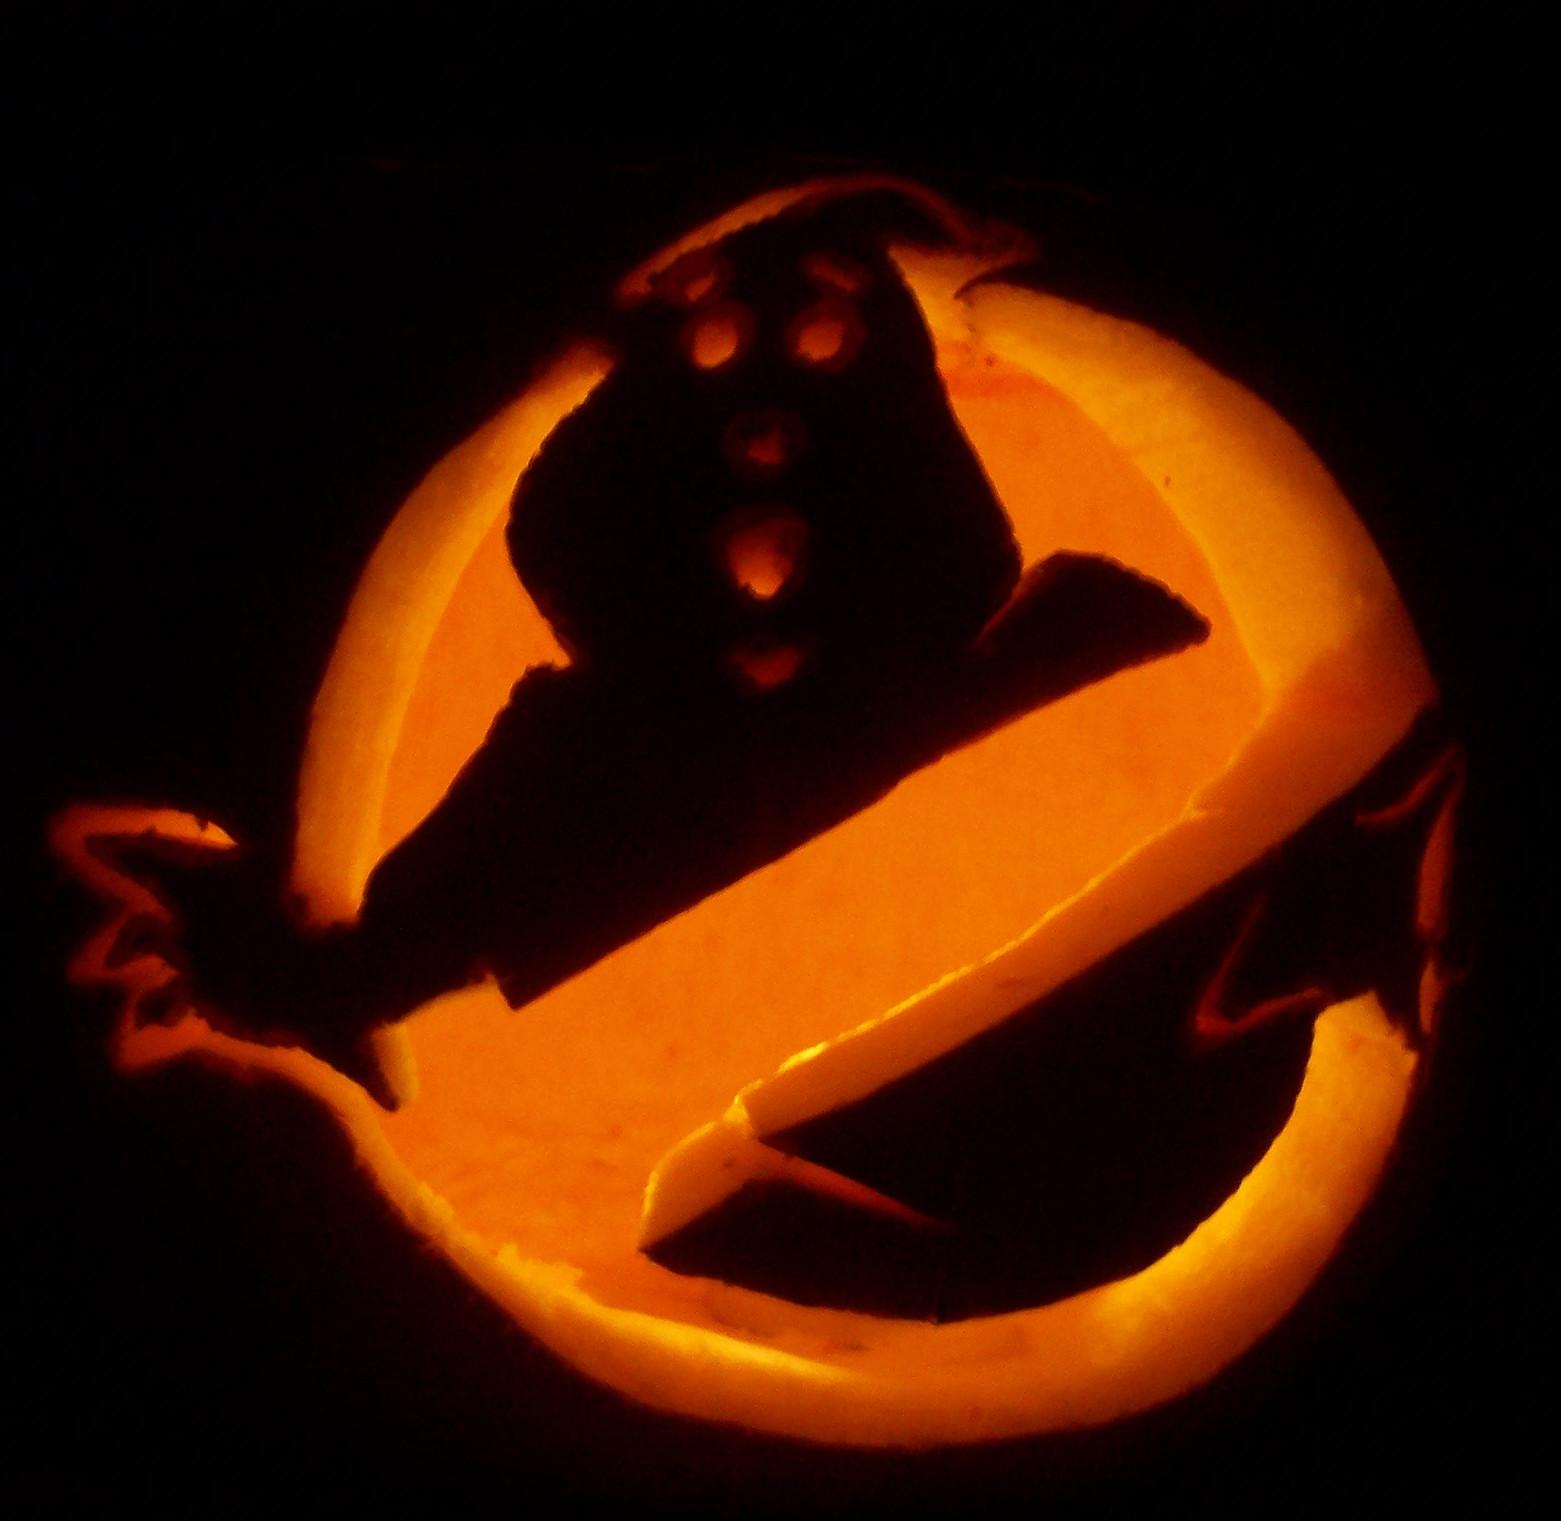 Ghostbusters Pumpkin Carving Ideas Www Topsimages Com